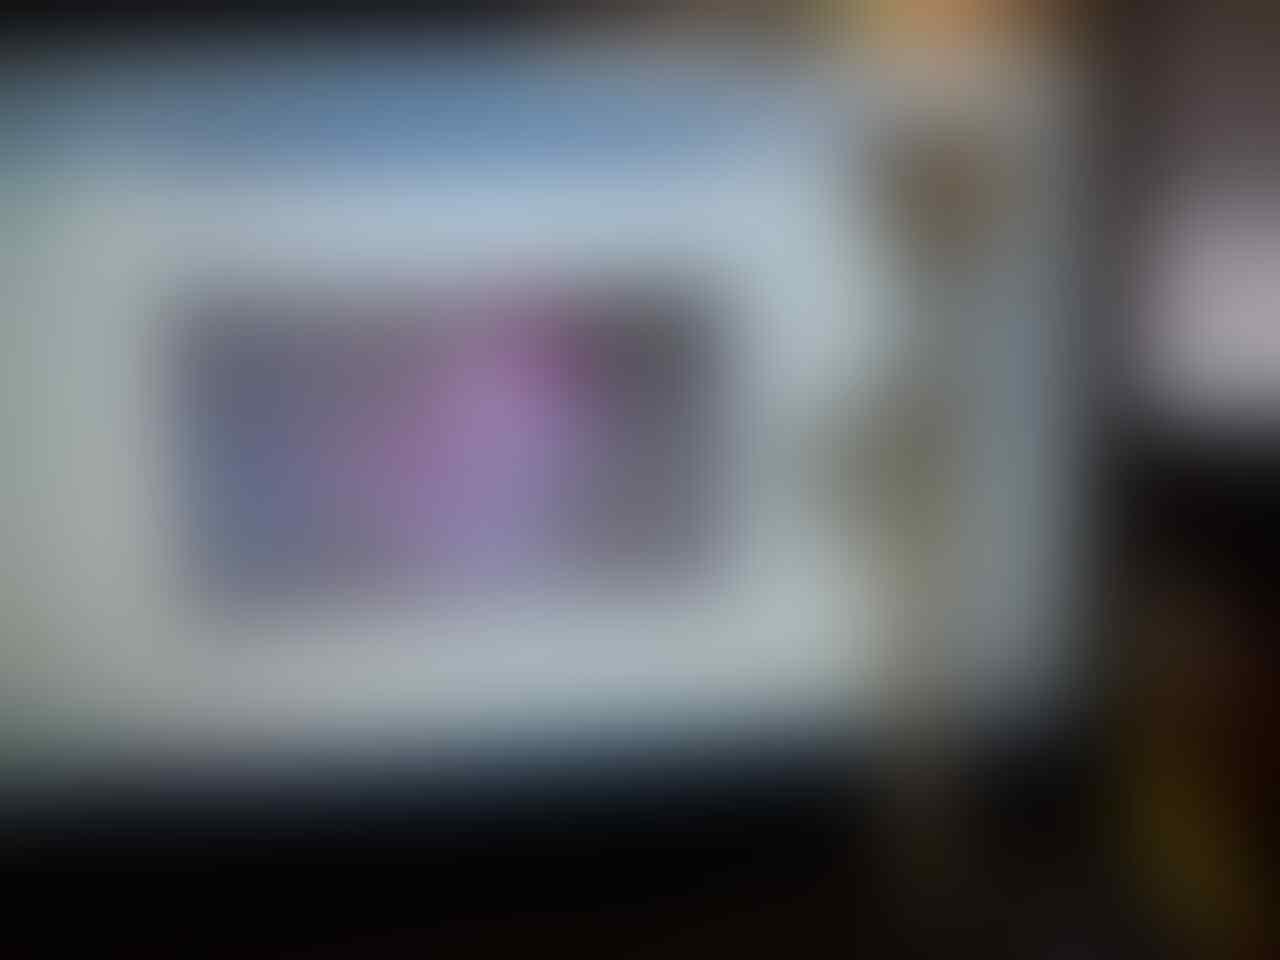 [FOTO] Cara Bikin SESUATU dari TISSU yang Bakal BIKIN CEWE agan KLEPEK-KLEPEK